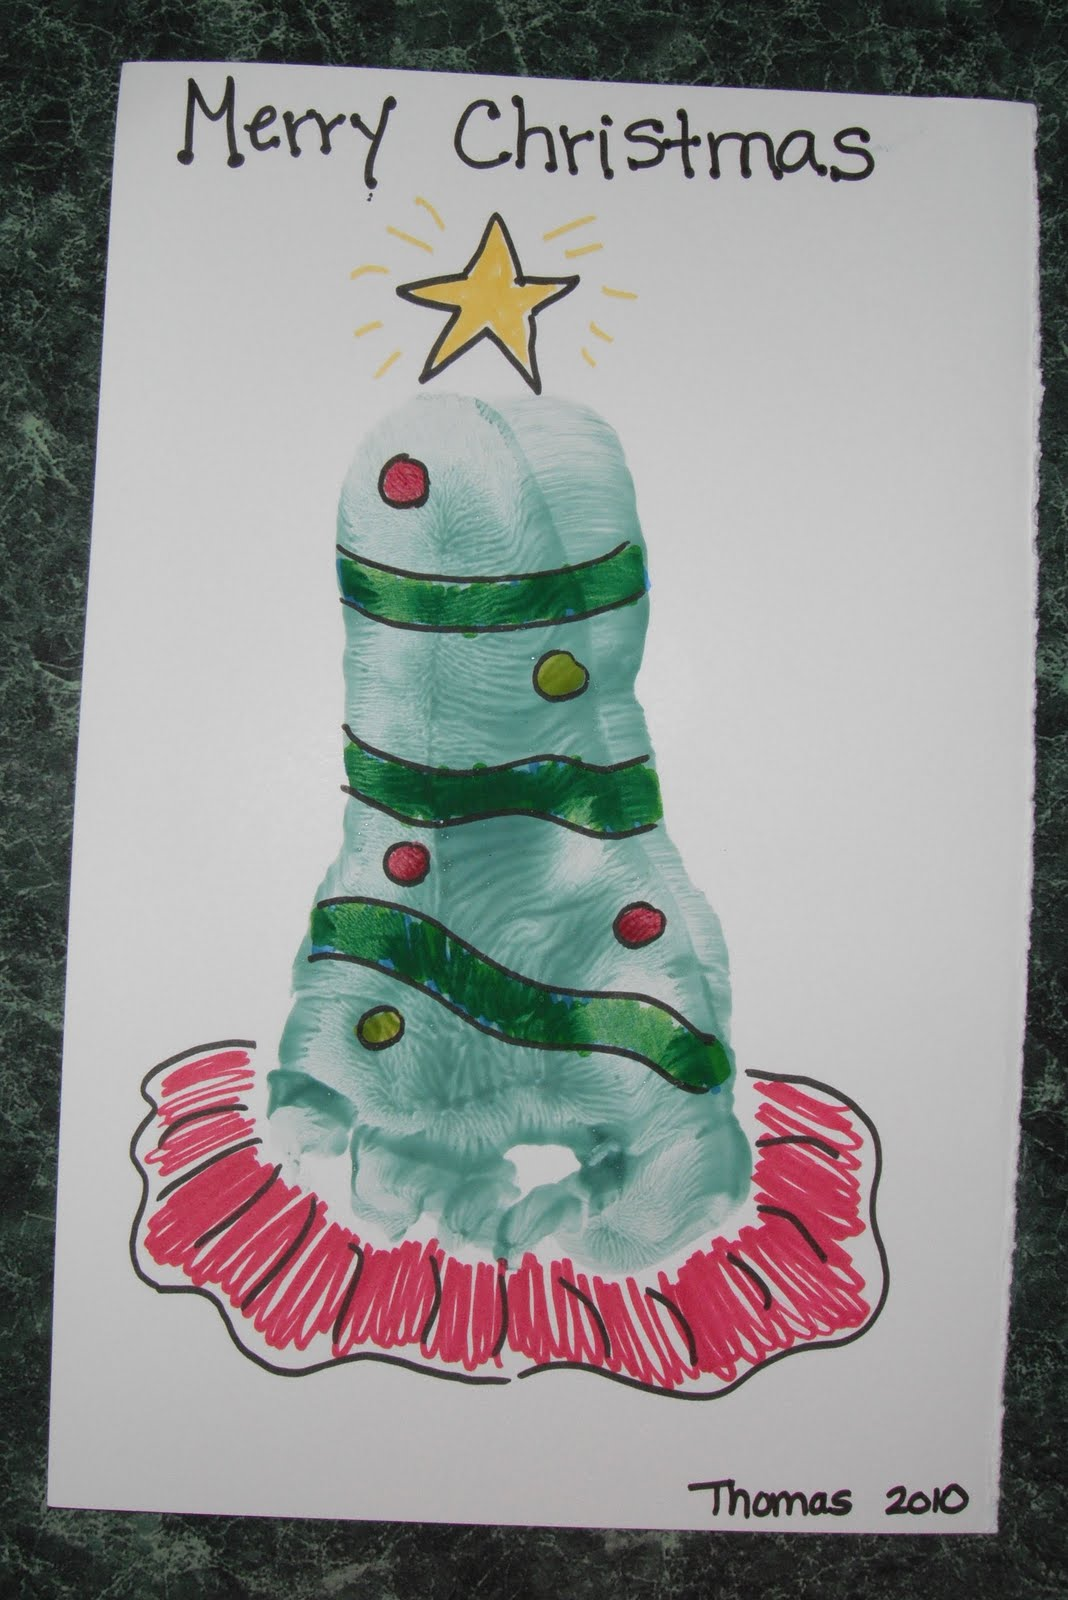 Play With Me: Footprint Christmas Tree